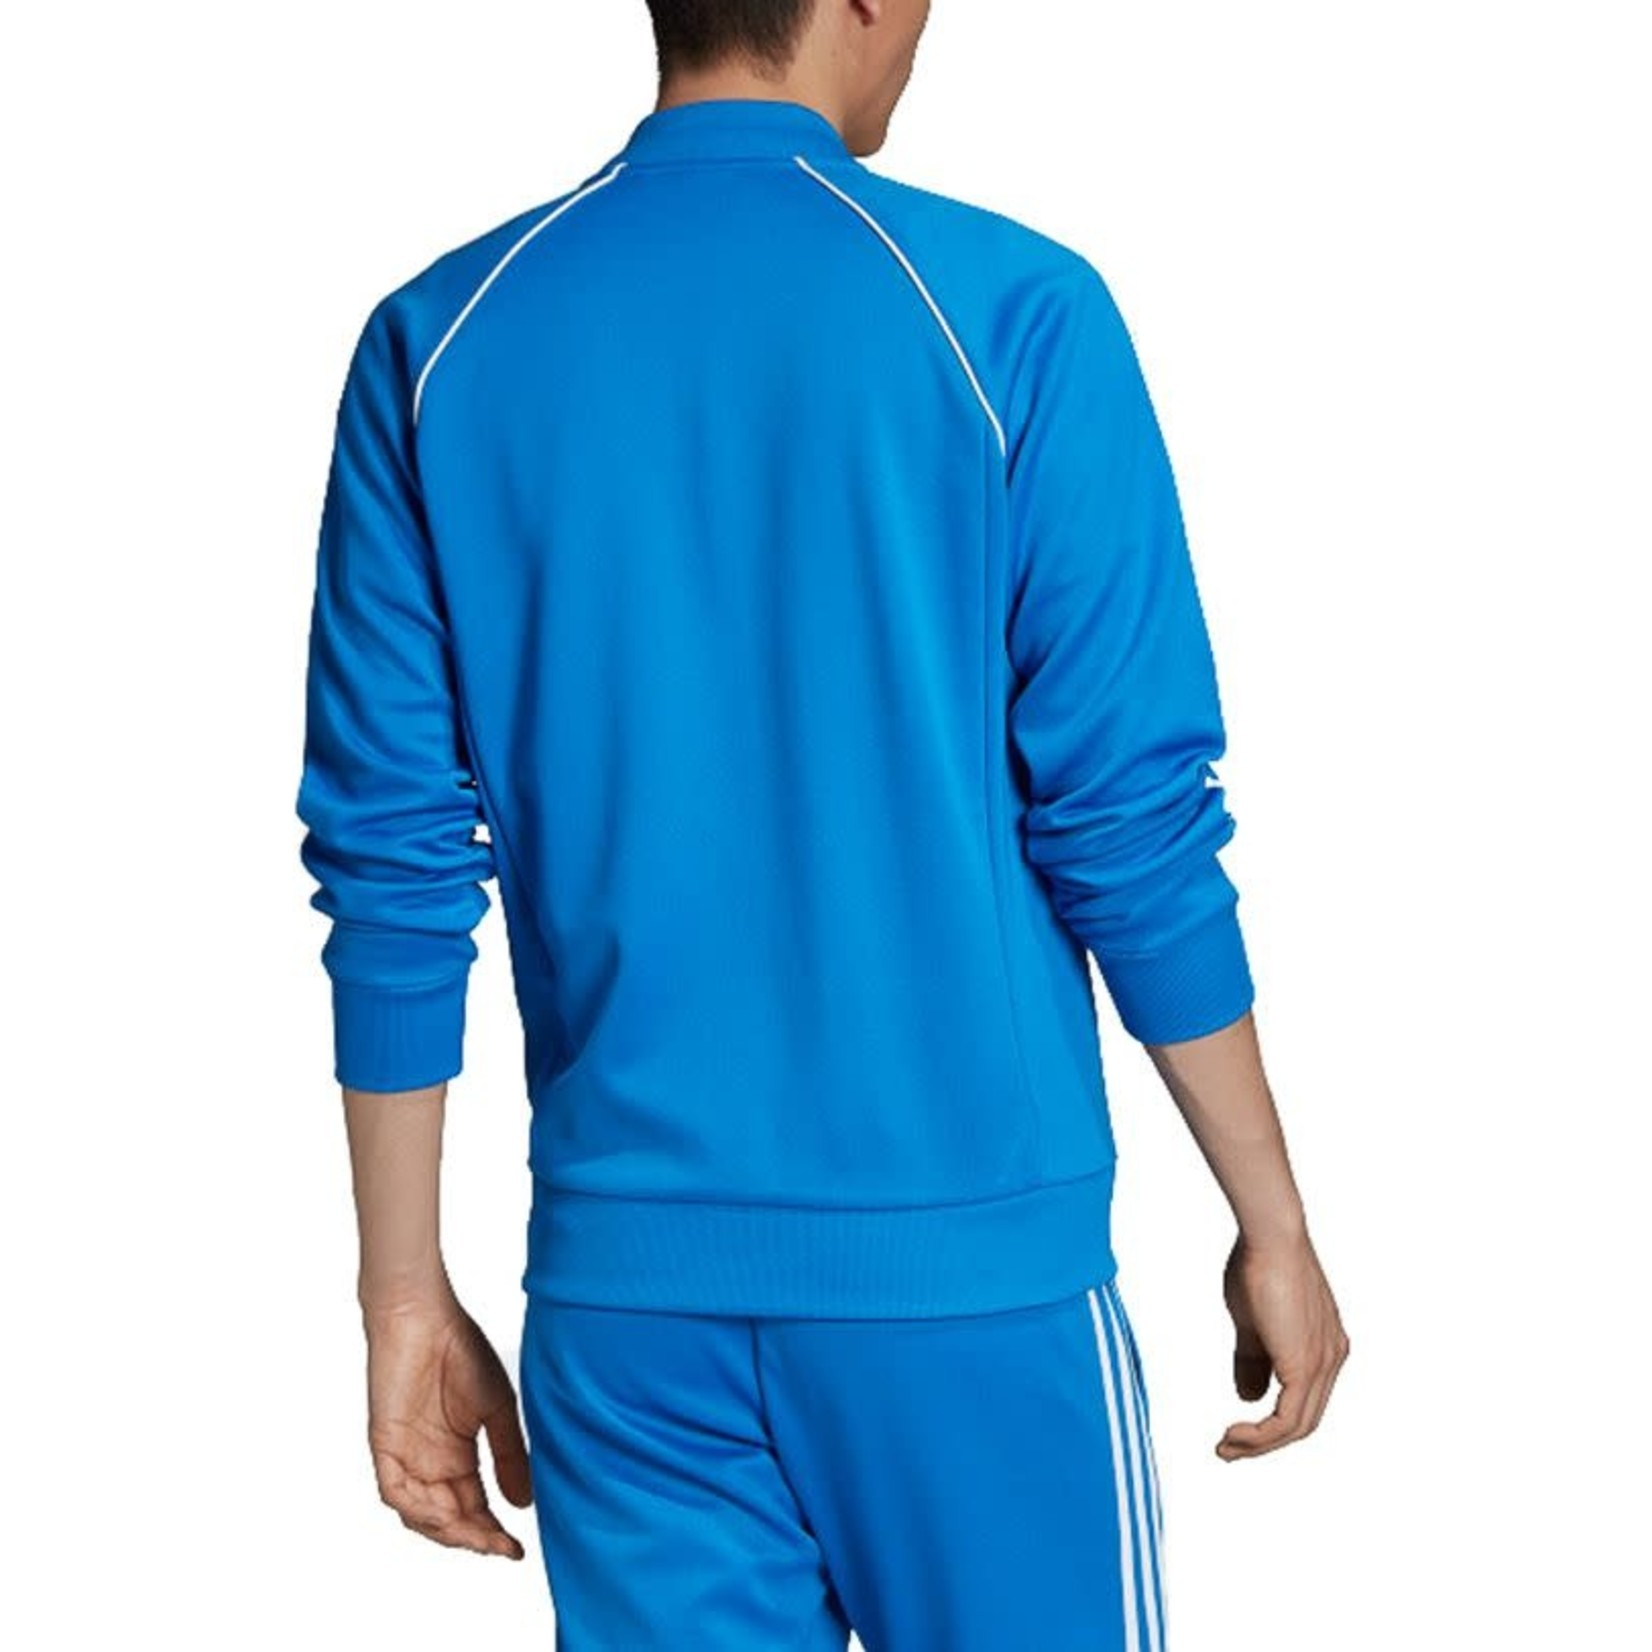 Adidas Adidas : SST Track Top - 001102726